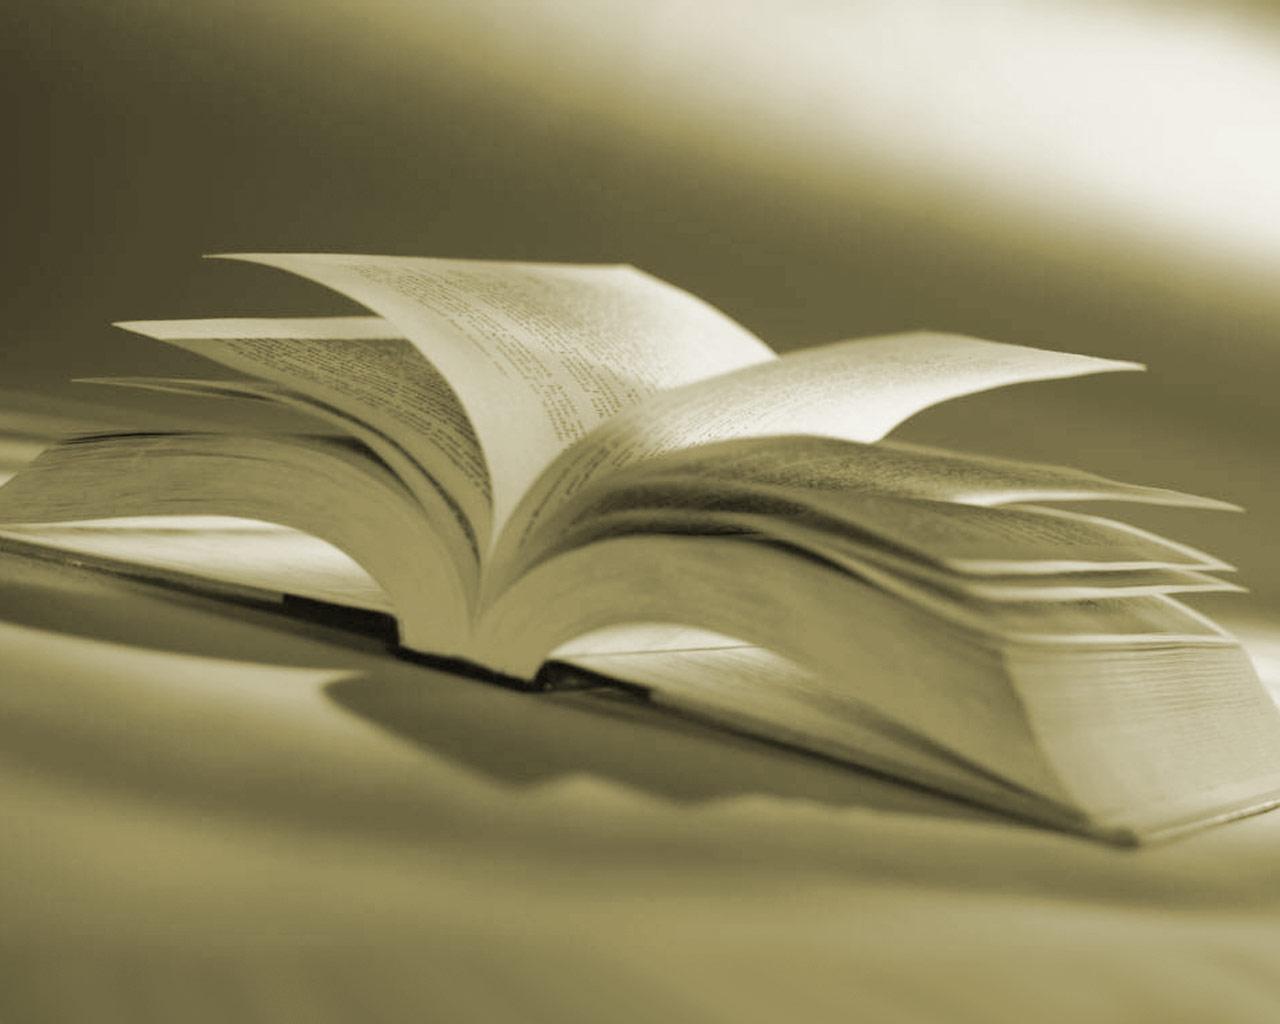 http://1.bp.blogspot.com/_cTXGuD89NEs/TETovfjVajI/AAAAAAAAAT8/0Ar7ZOqm4JU/s1600/Books_LibraryWallpaper.jpg